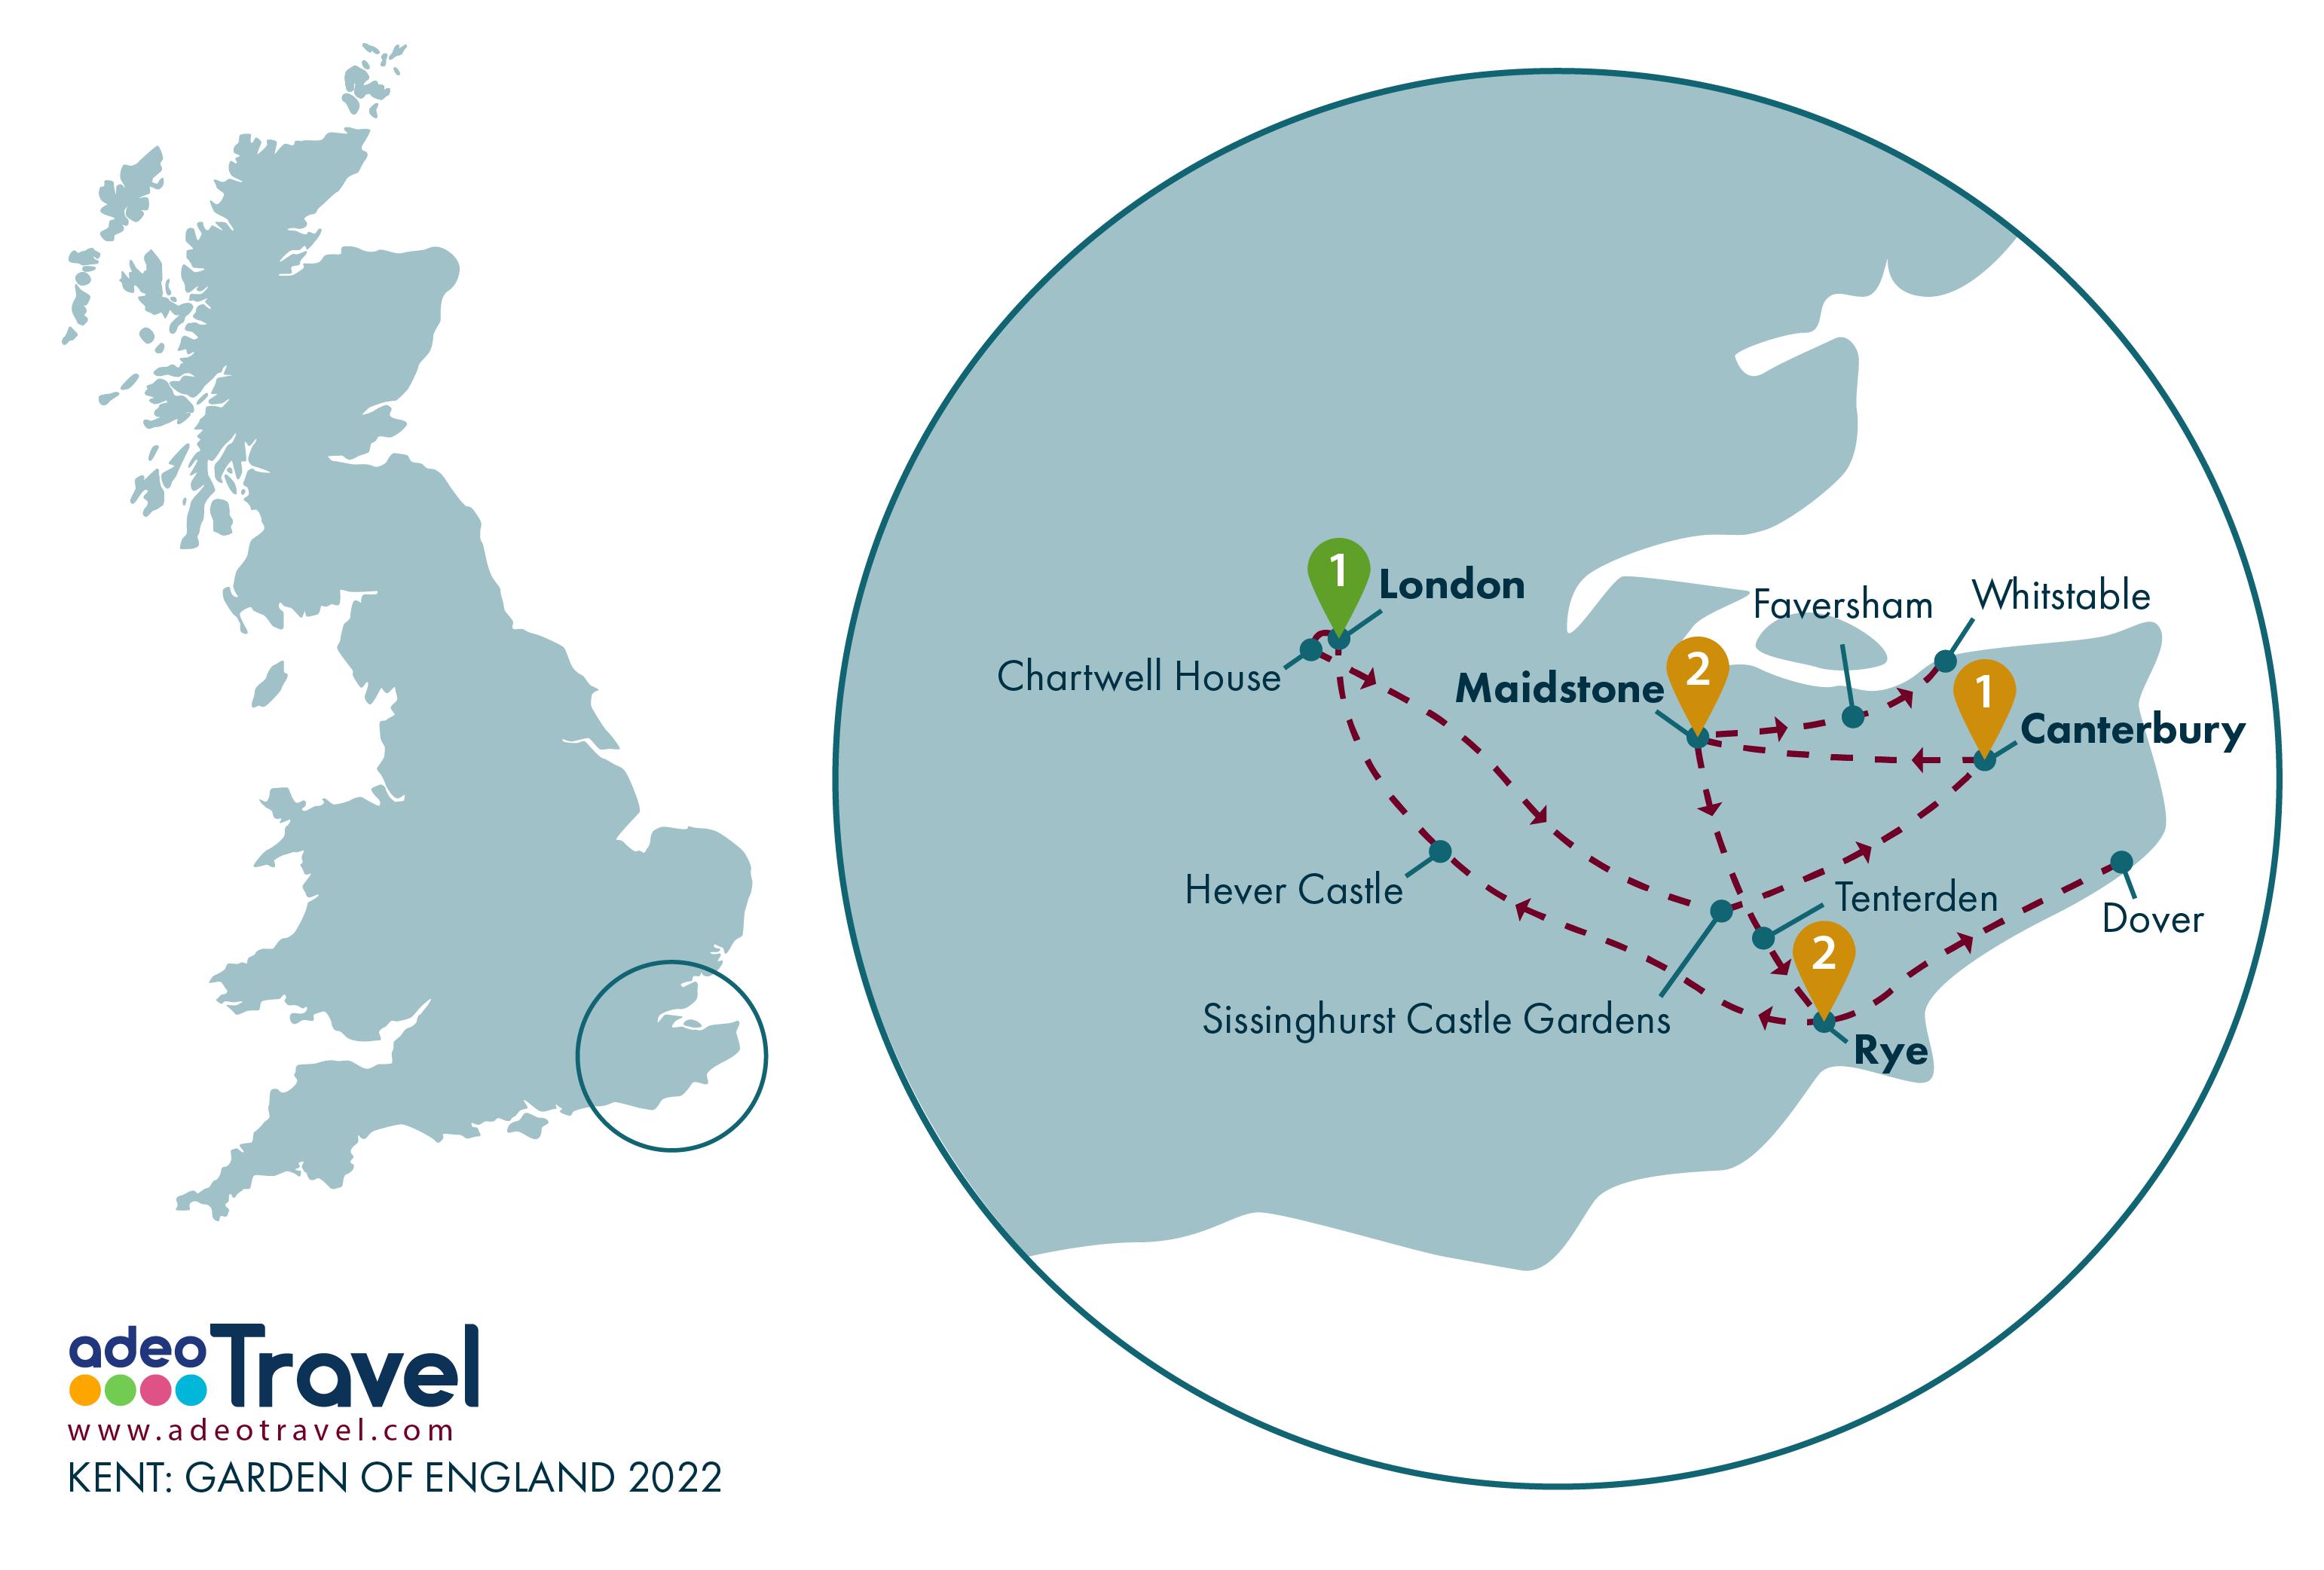 Map - Kent Garden of England 2022